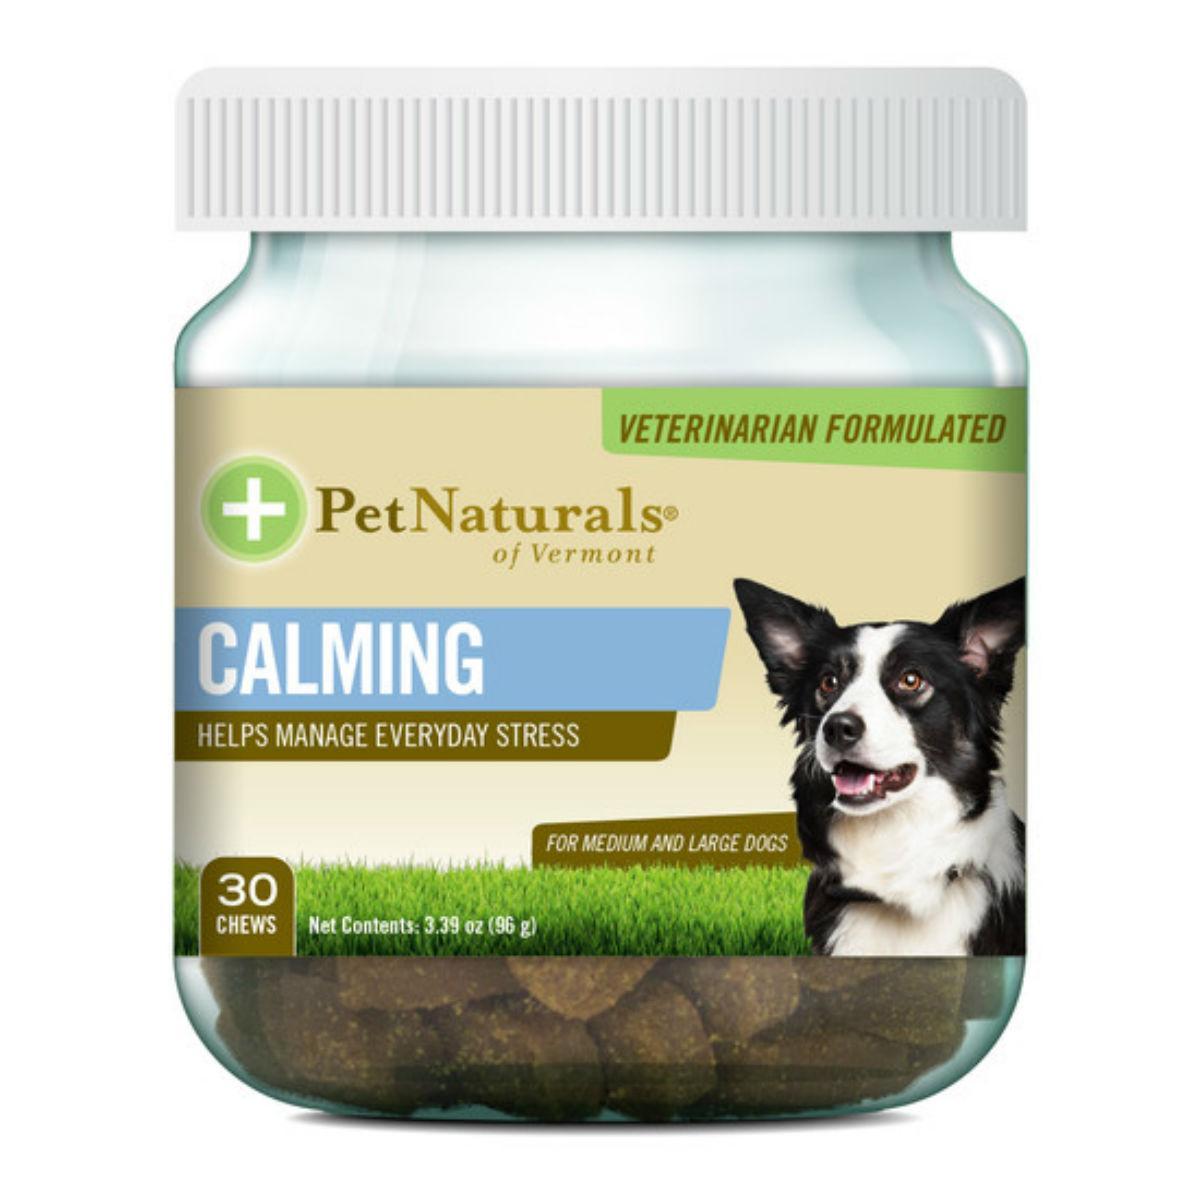 Pet Naturals Calming Chews for Medium & Large Dogs